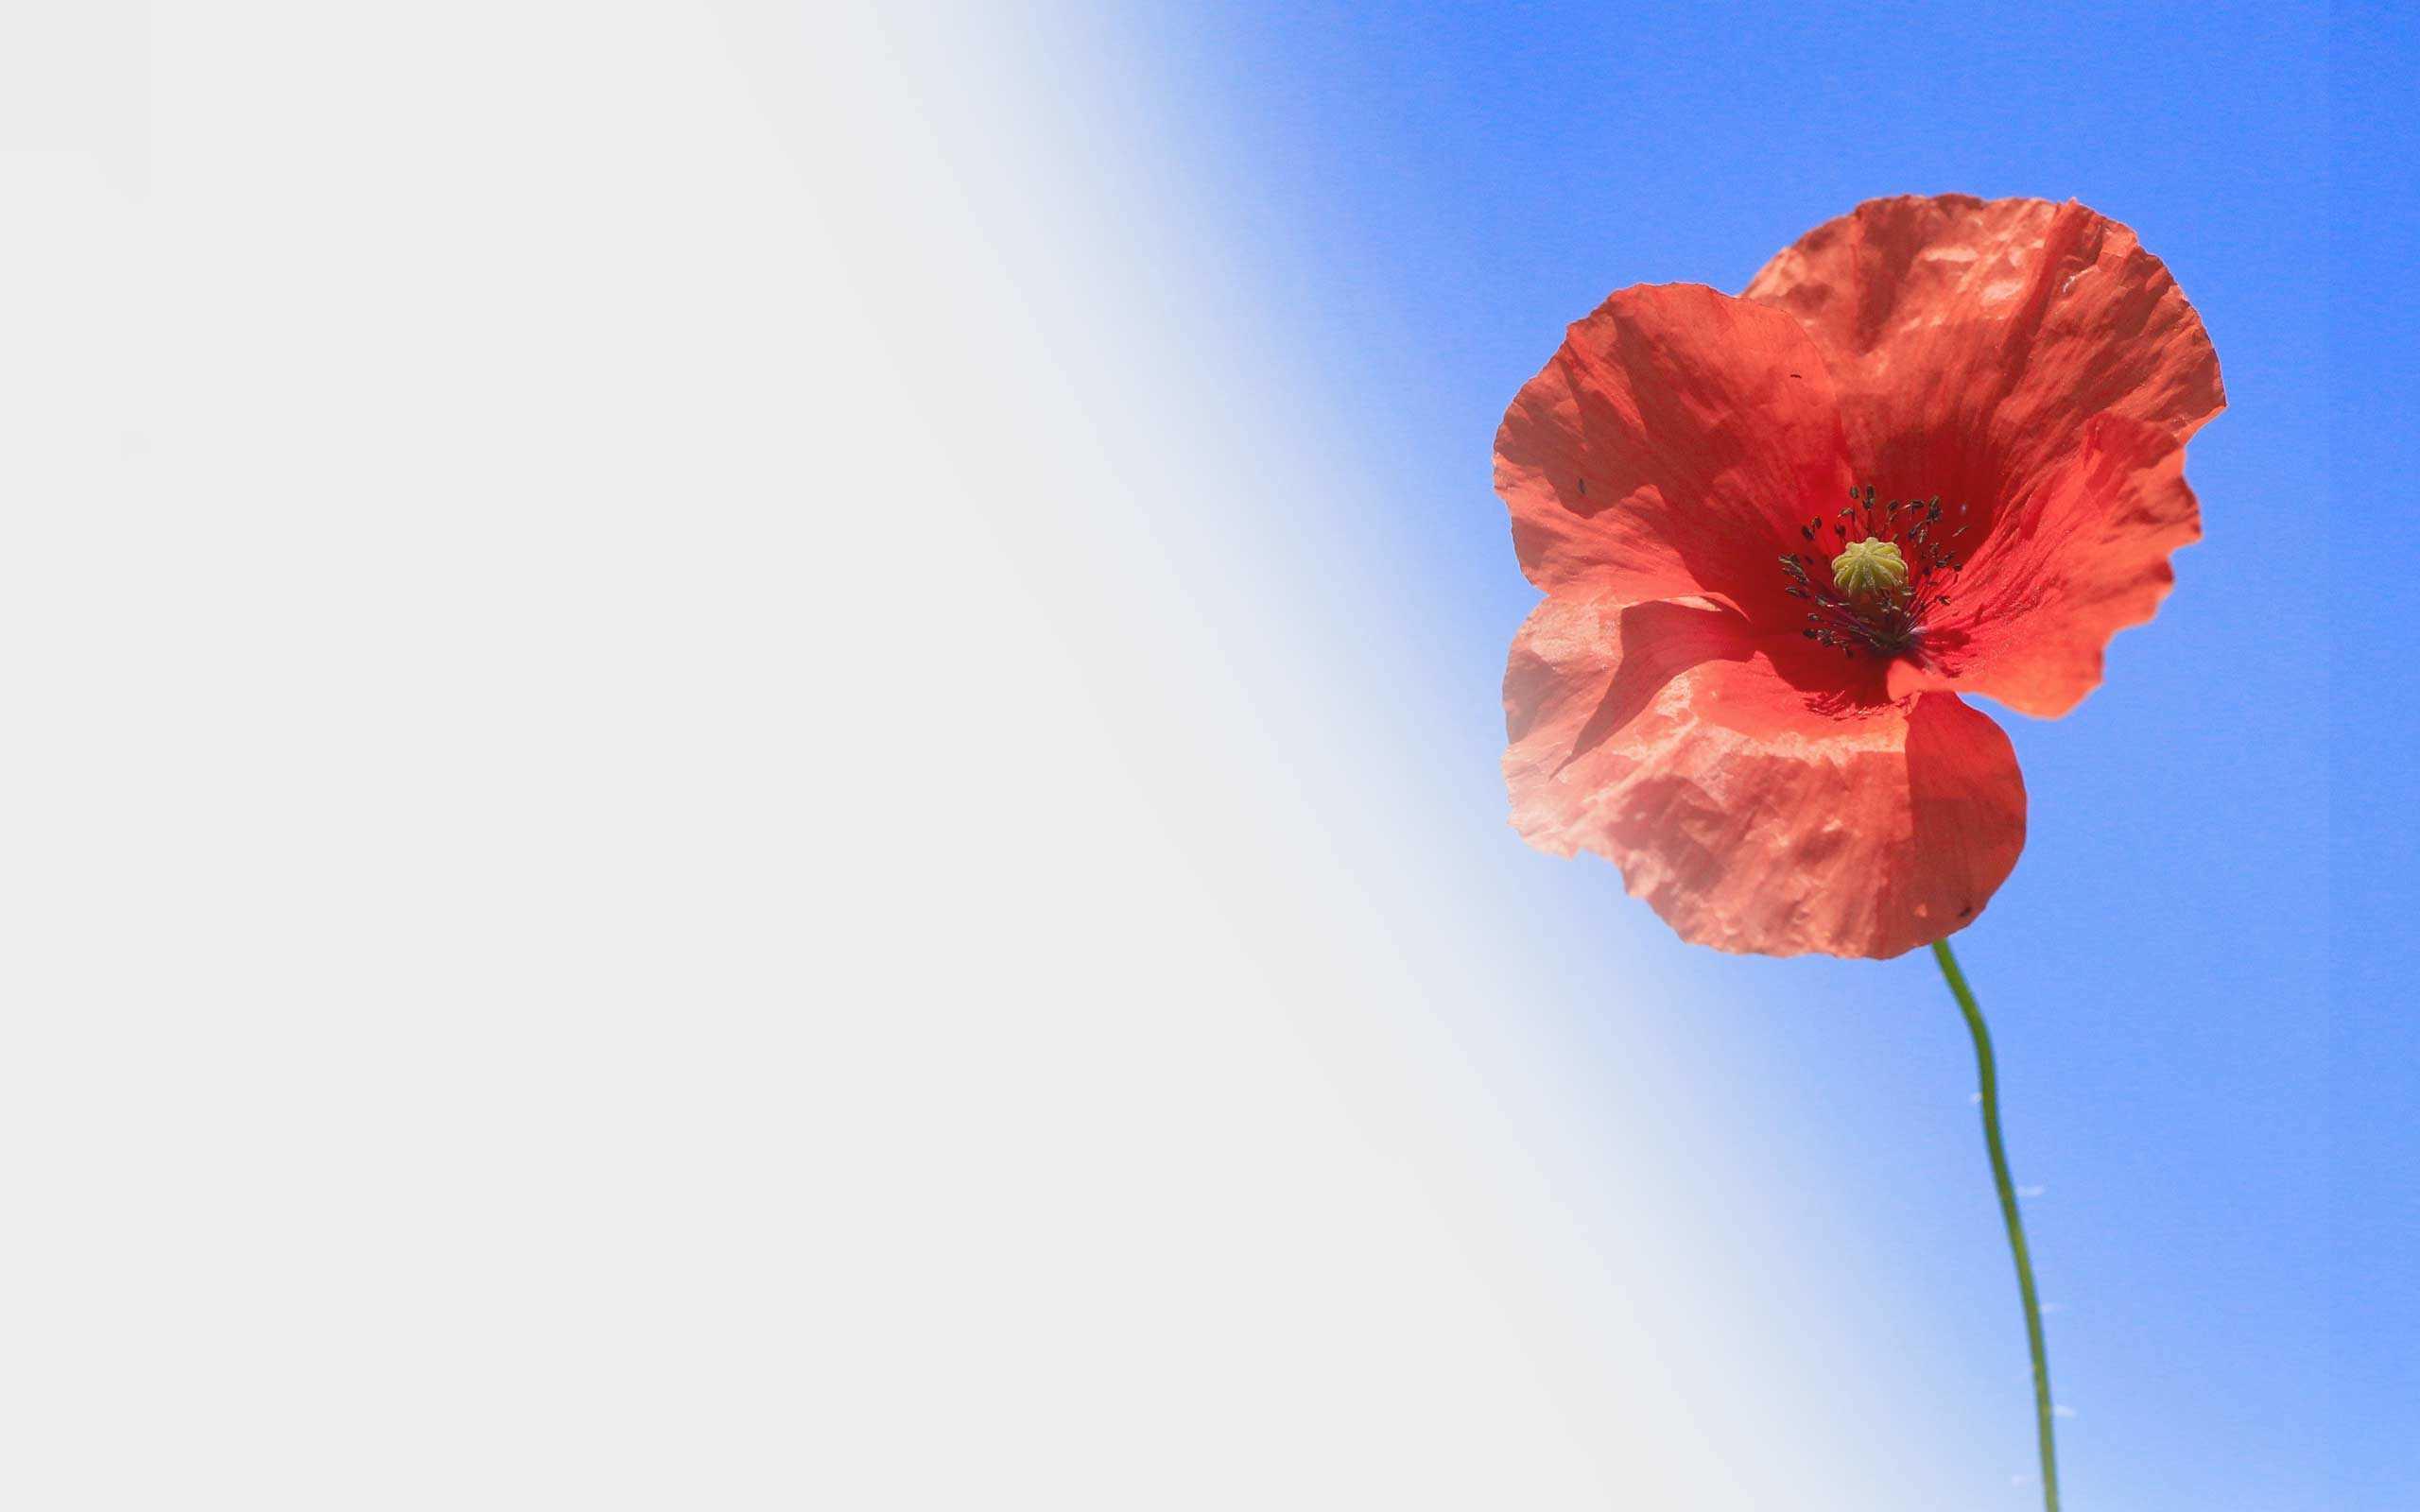 heavenly-spa-hilton-head-spa-veterans-special